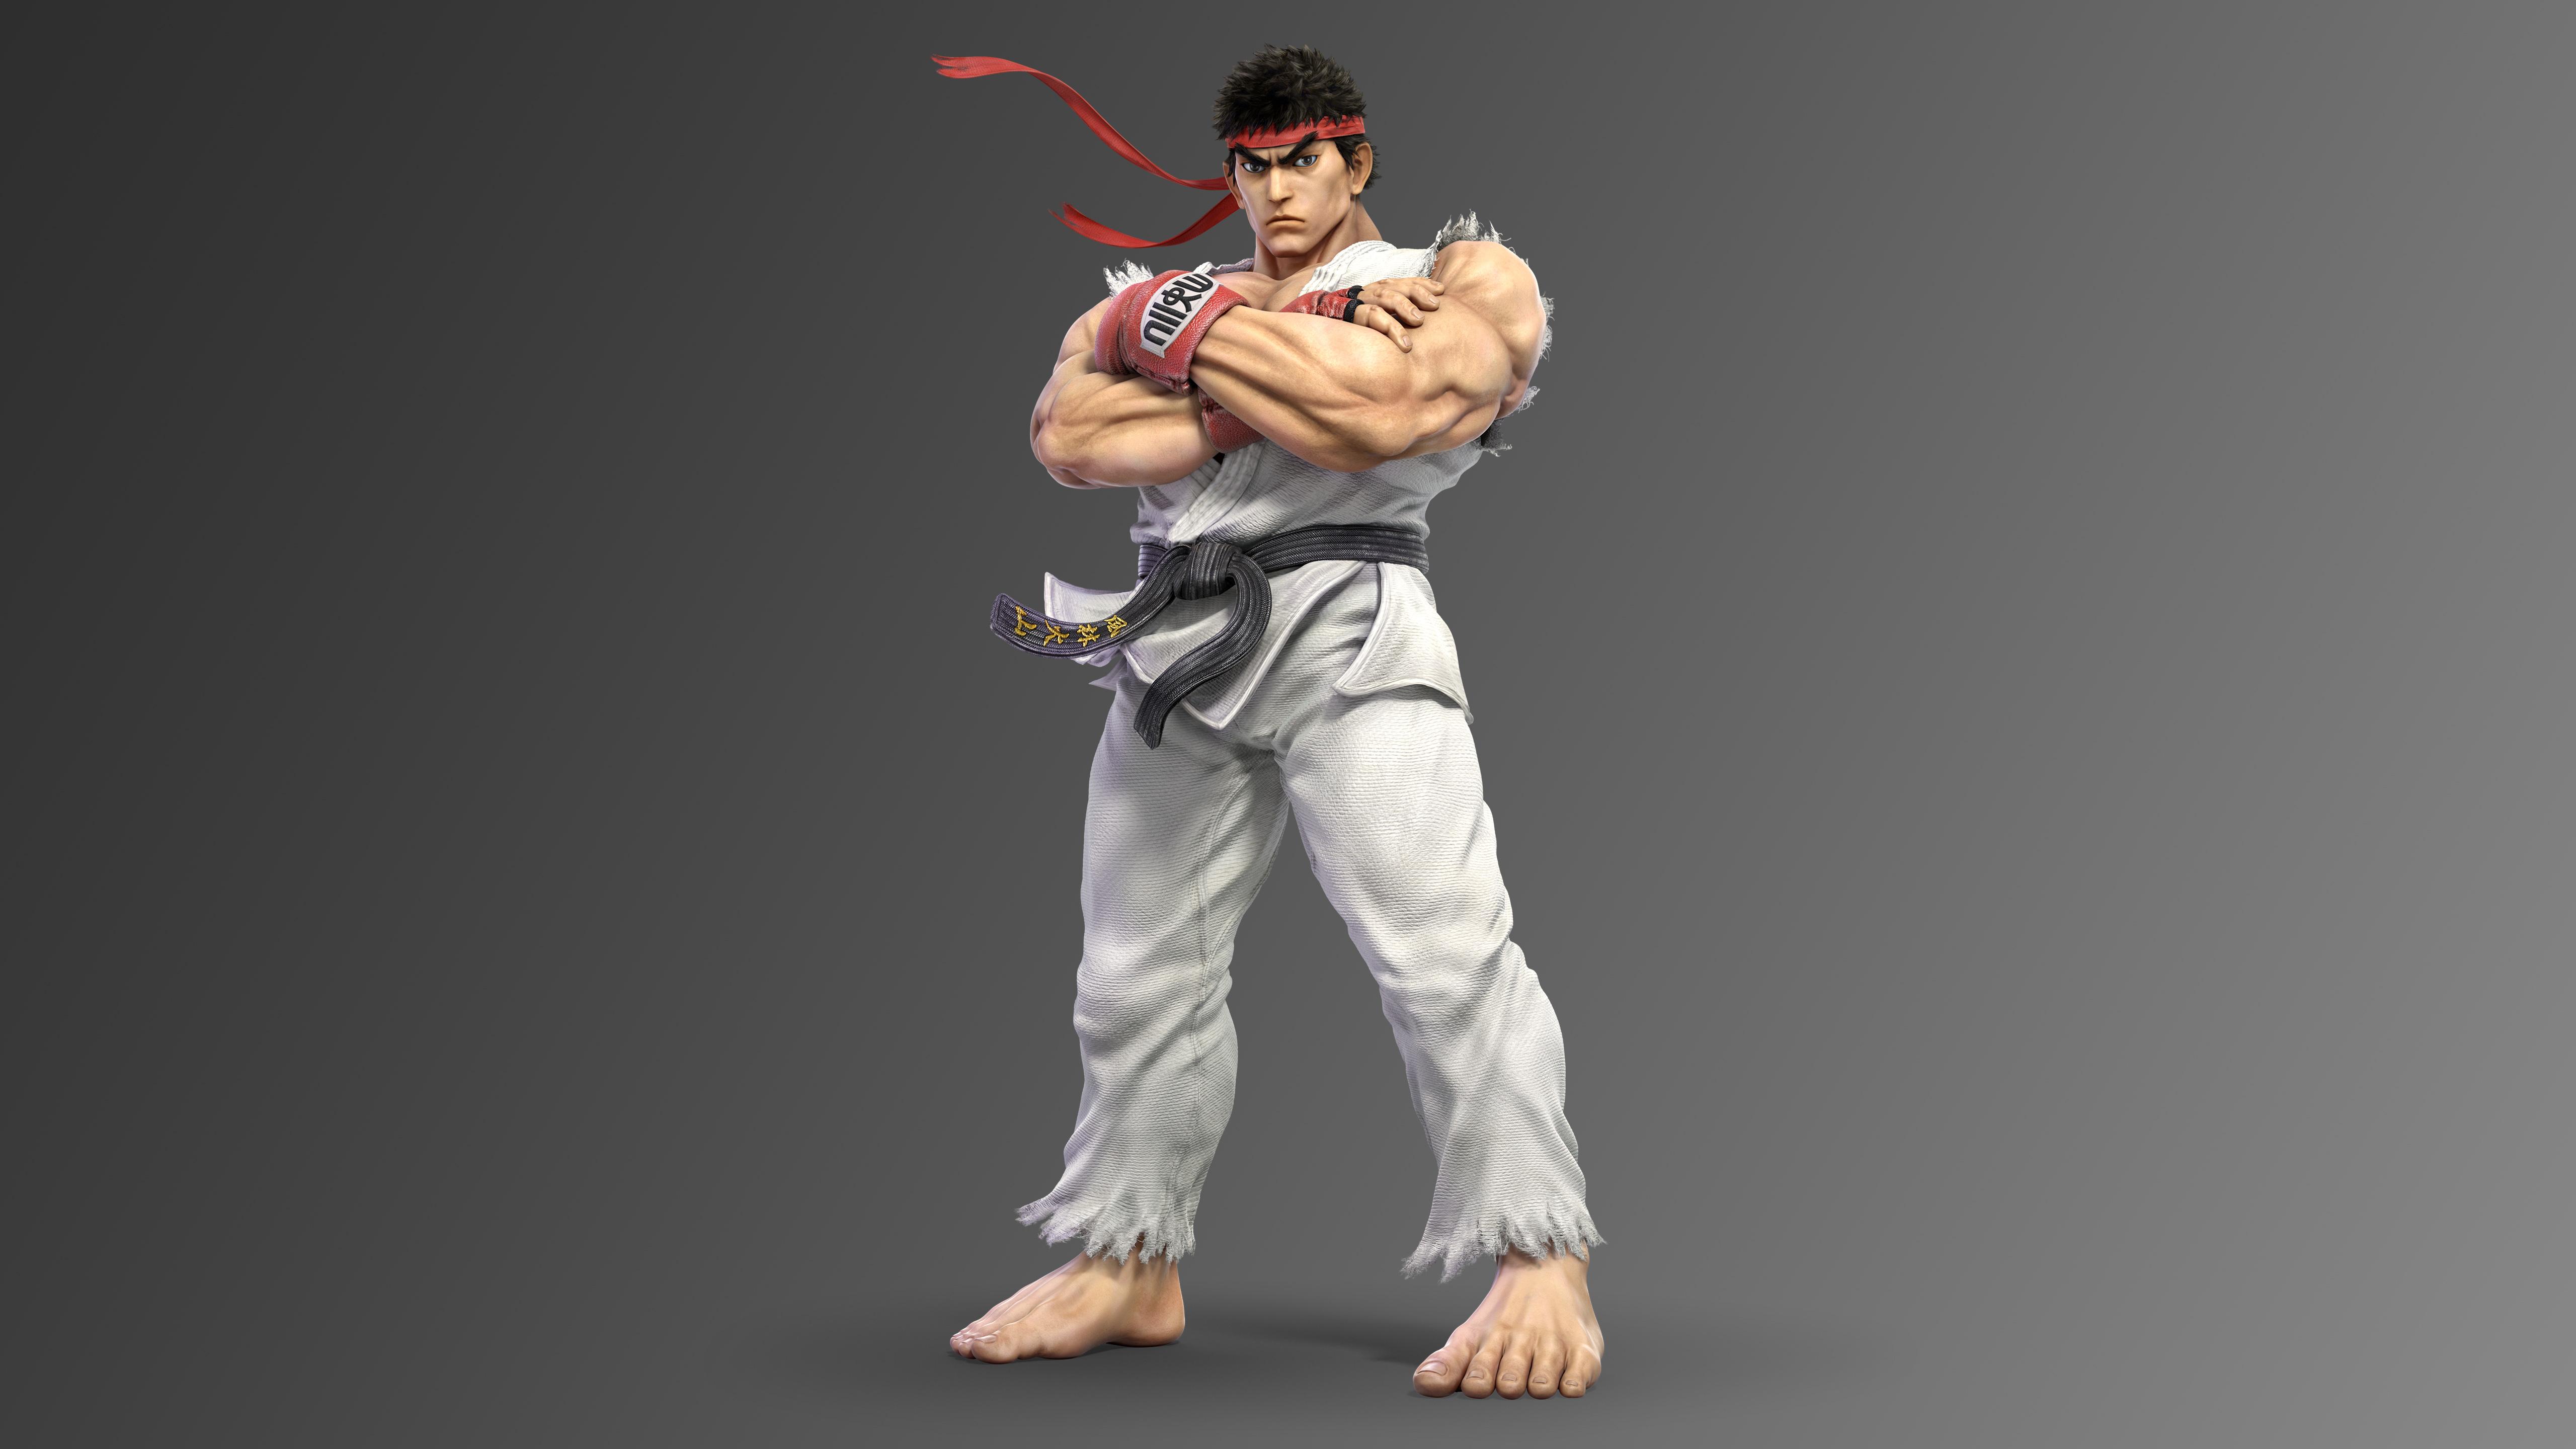 Ryu Super Smash Bros Ultimate 5k, HD Games, 4k Wallpapers